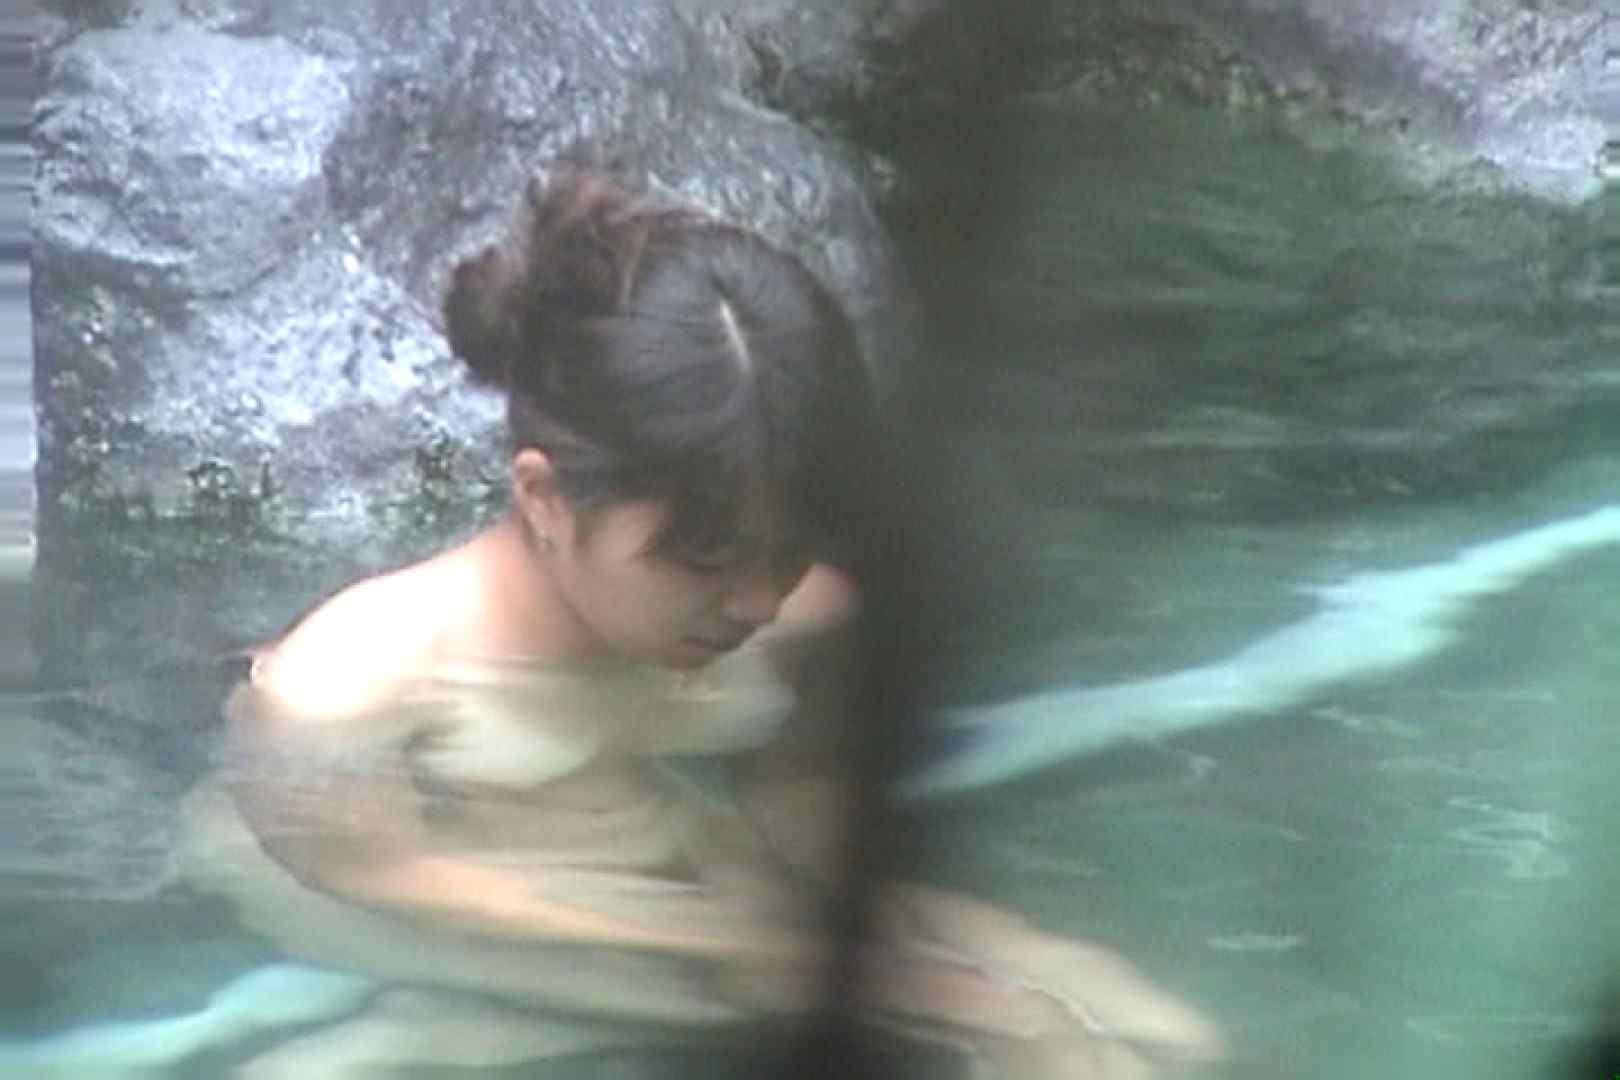 Aquaな露天風呂Vol.69【VIP限定】 OLのエロ生活   露天風呂  106連発 31